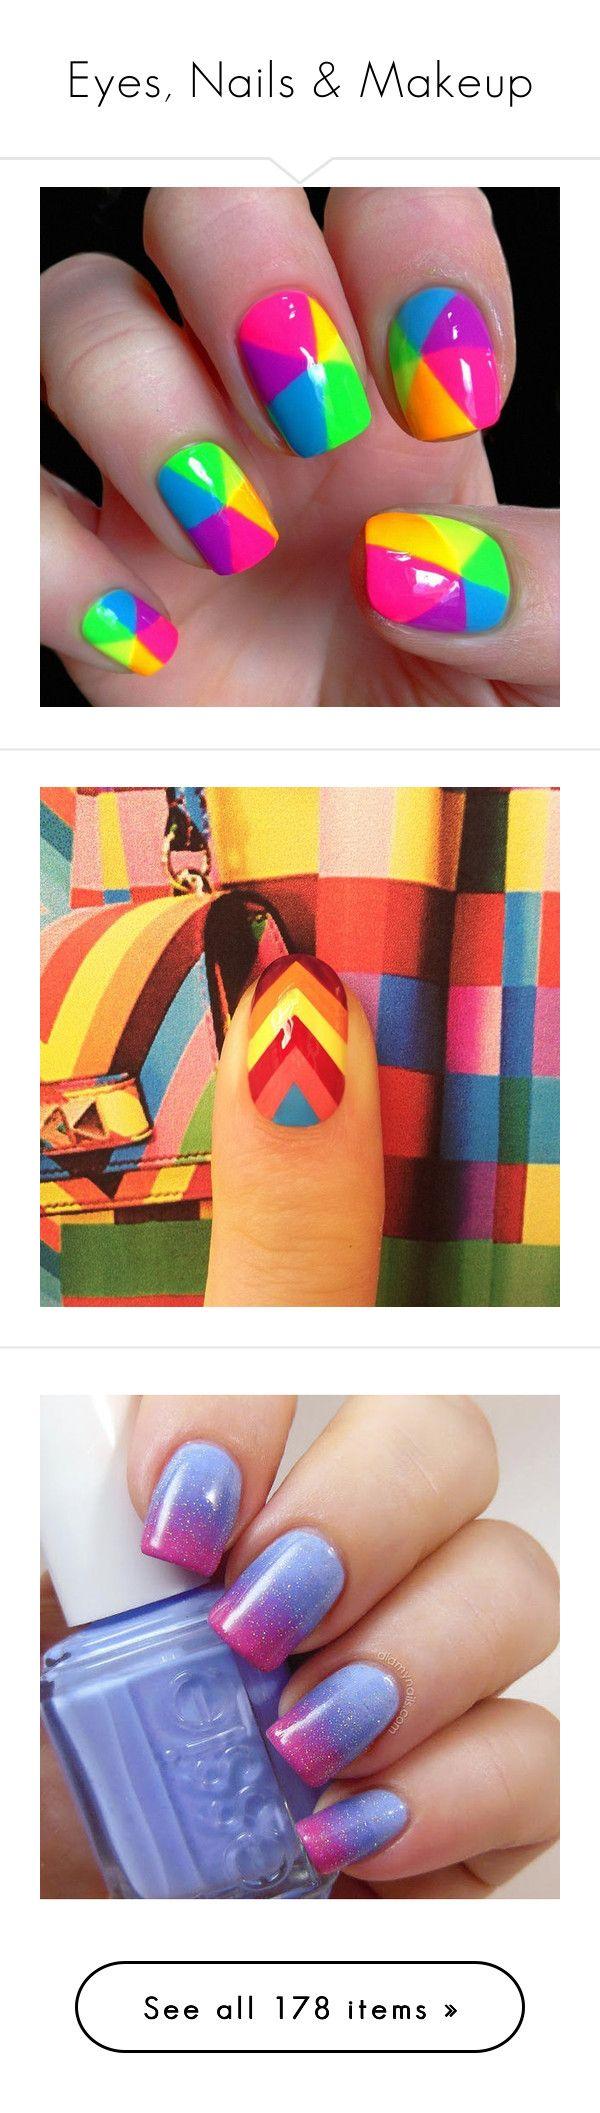 """Eyes, Nails & Makeup"" by notaliice-riley ❤ liked on Polyvore featuring beauty products, nail care, nail polish, nails, beauty, makeup, nail art, neon nail polish, fluorescent nail polish and shiny nail polish"